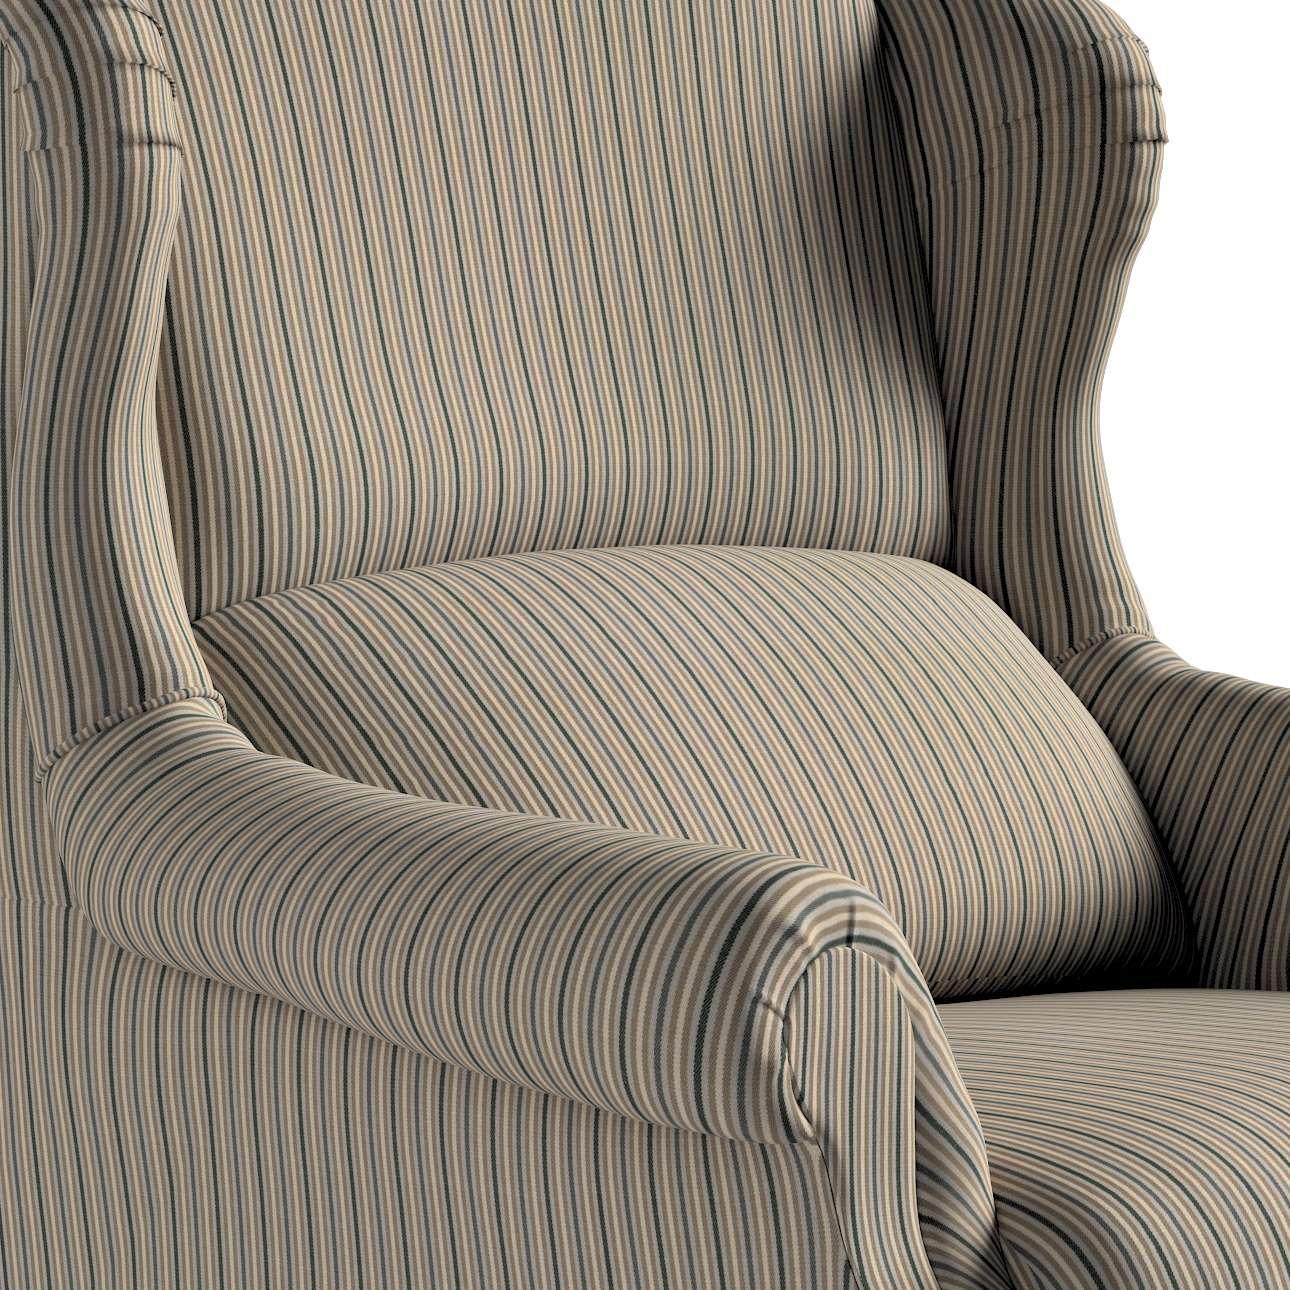 Fotel Unique w kolekcji Londres, tkanina: 143-38